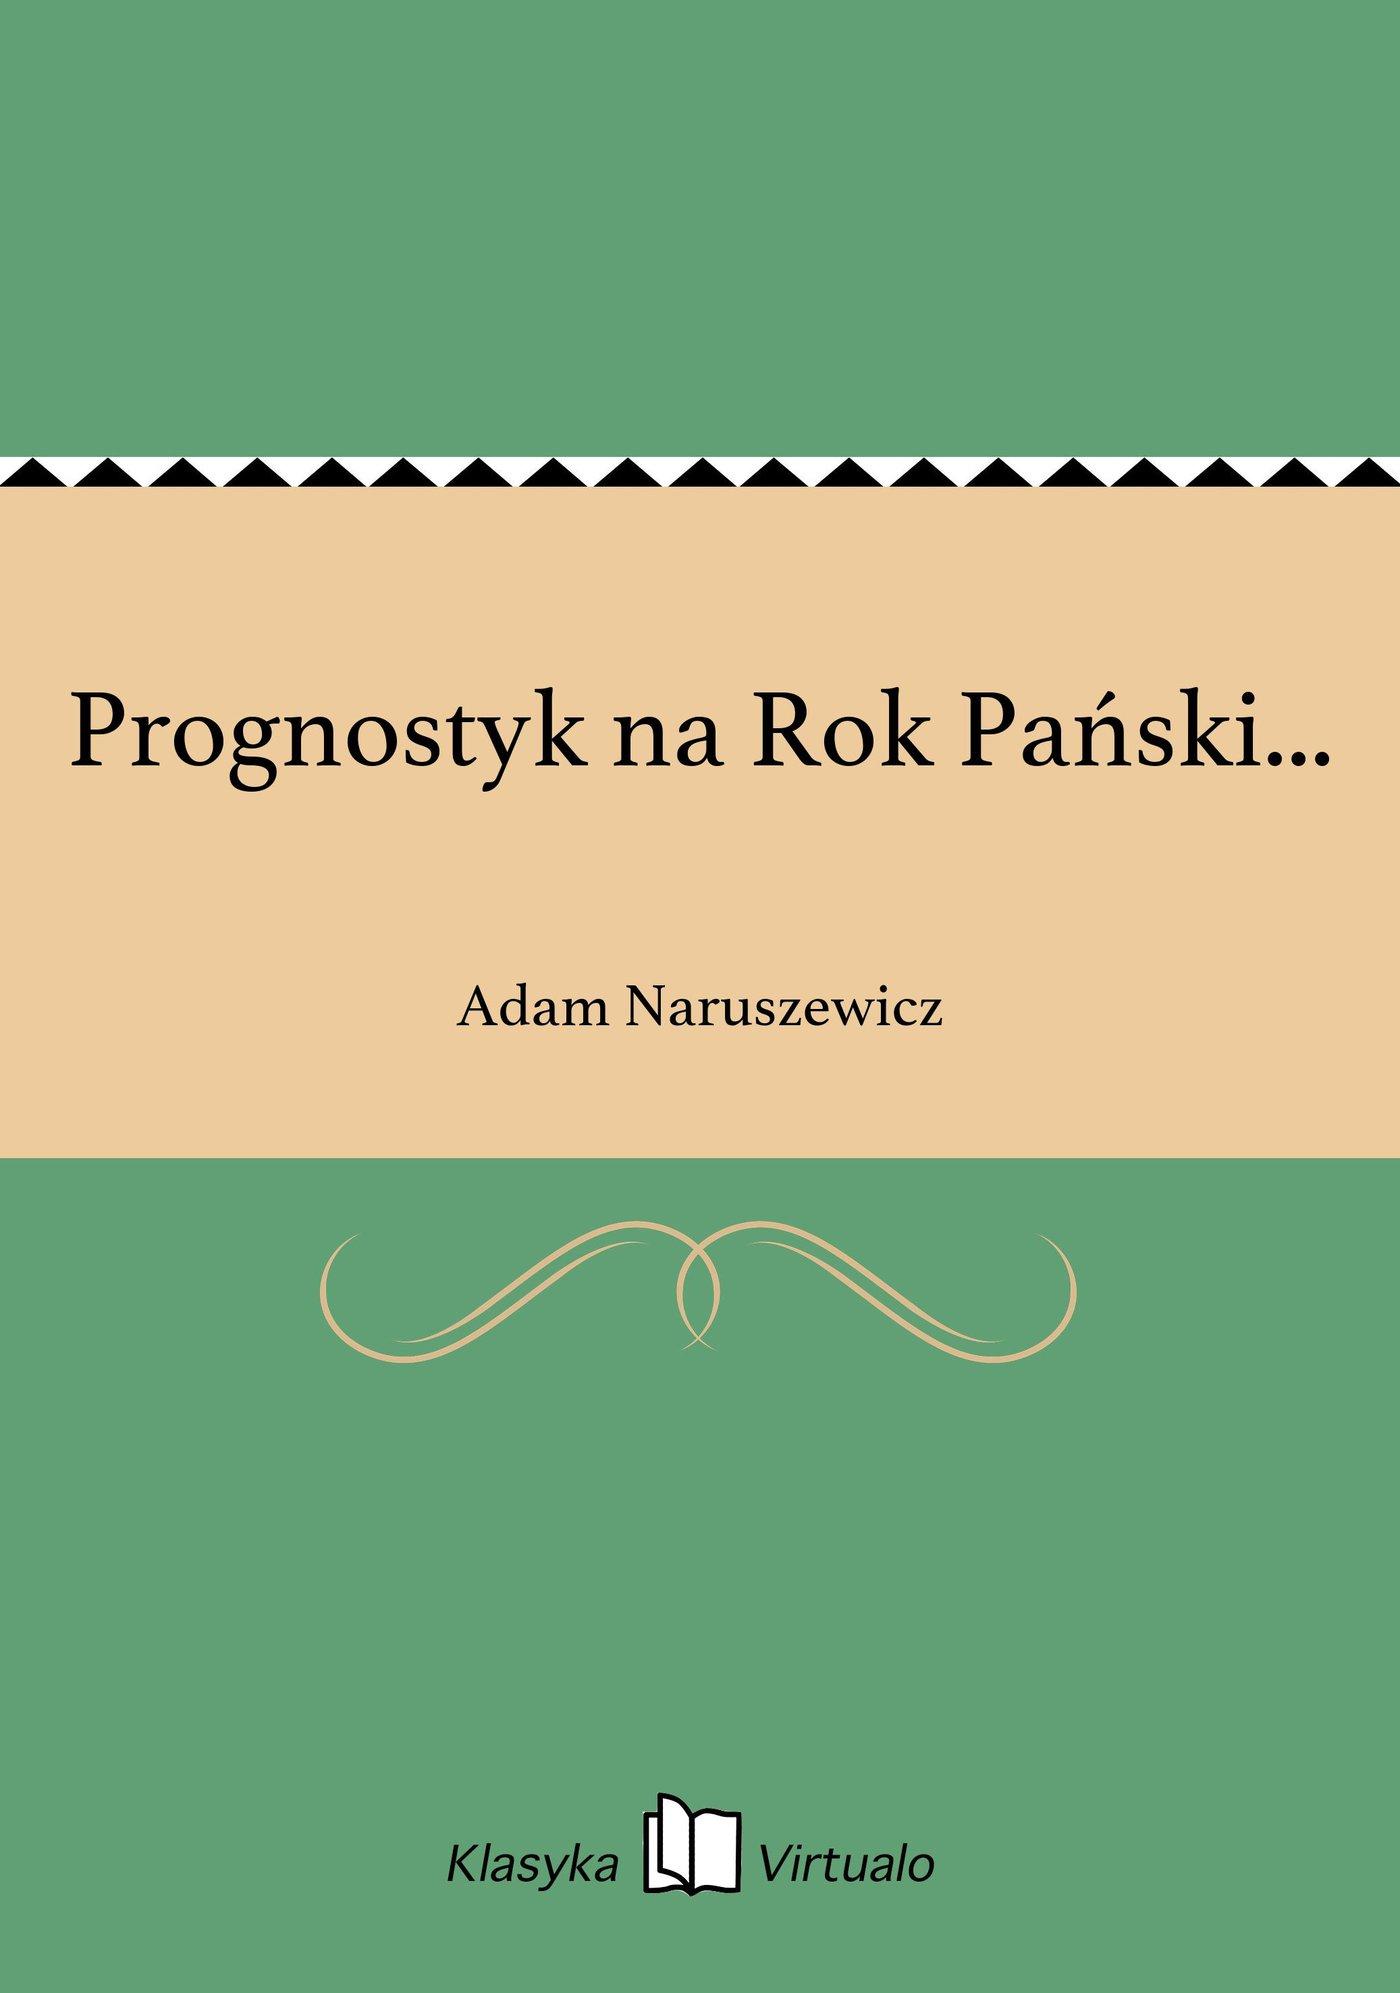 Prognostyk na Rok Pański... - Ebook (Książka EPUB) do pobrania w formacie EPUB